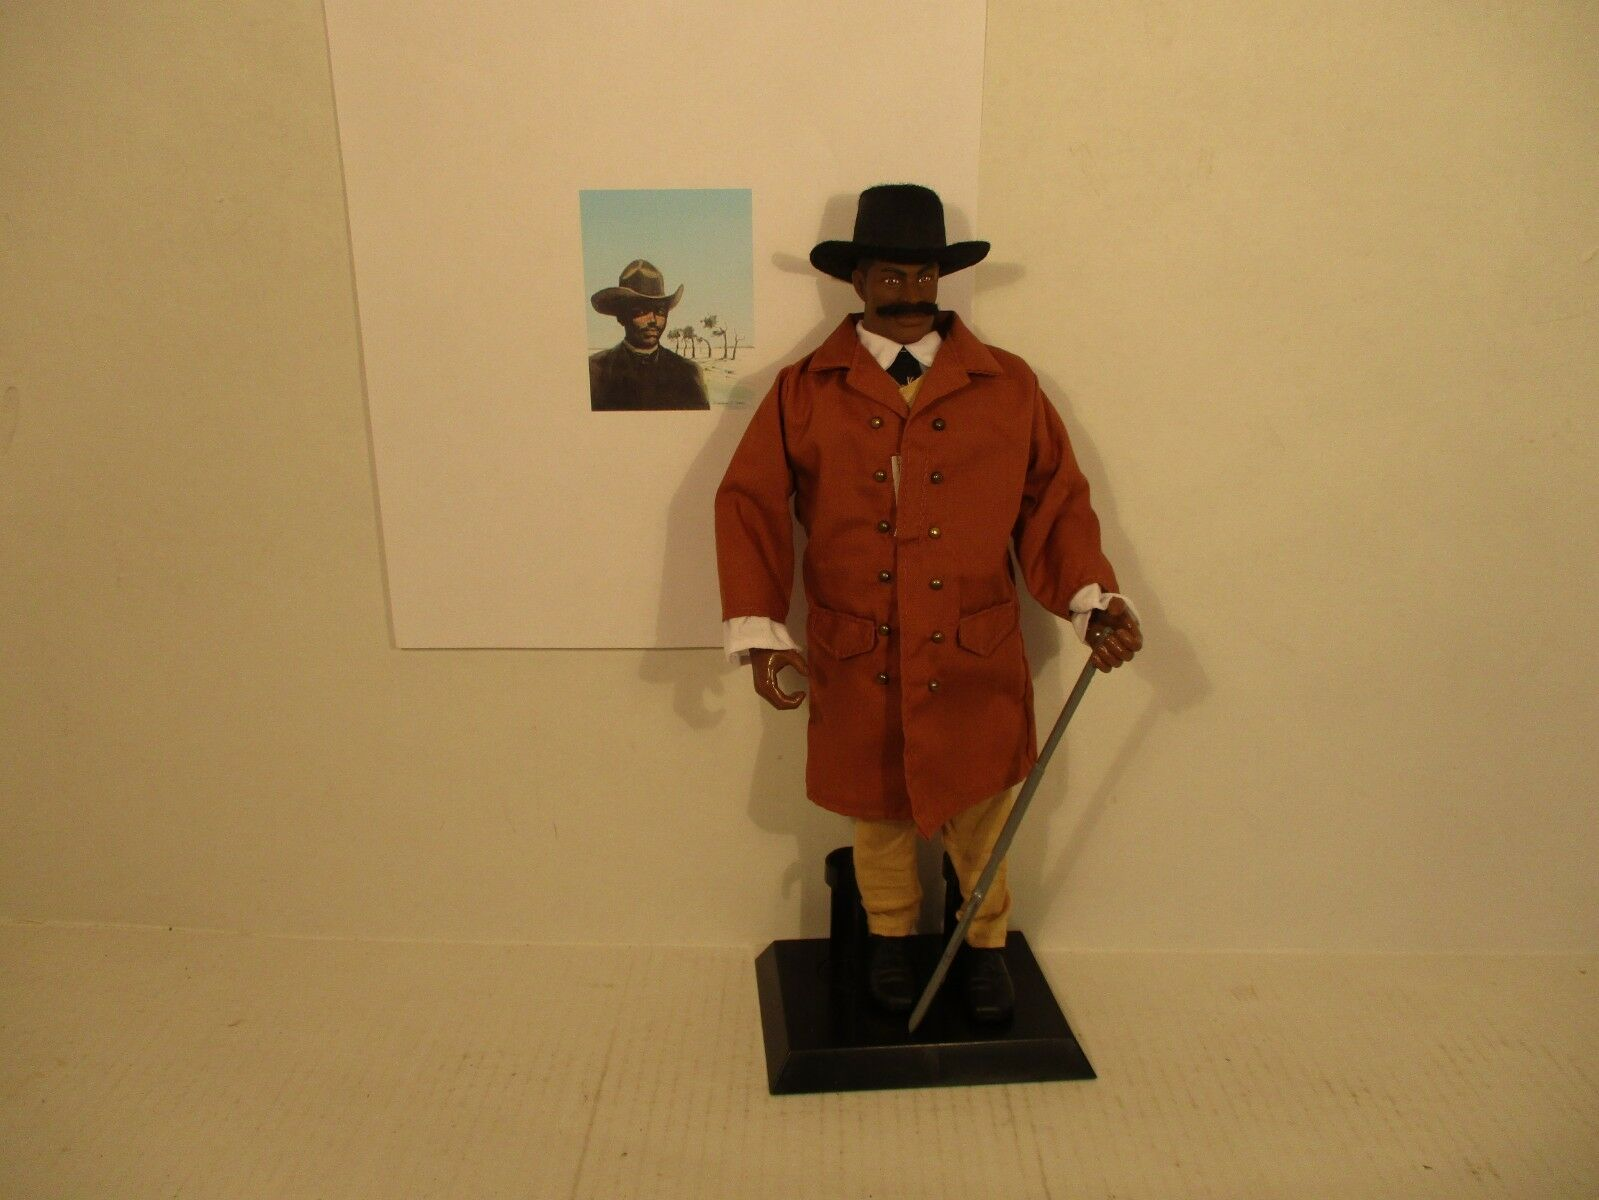 Bose - ikard cowboy - scout joshua deets alte west - 1   12  - figur